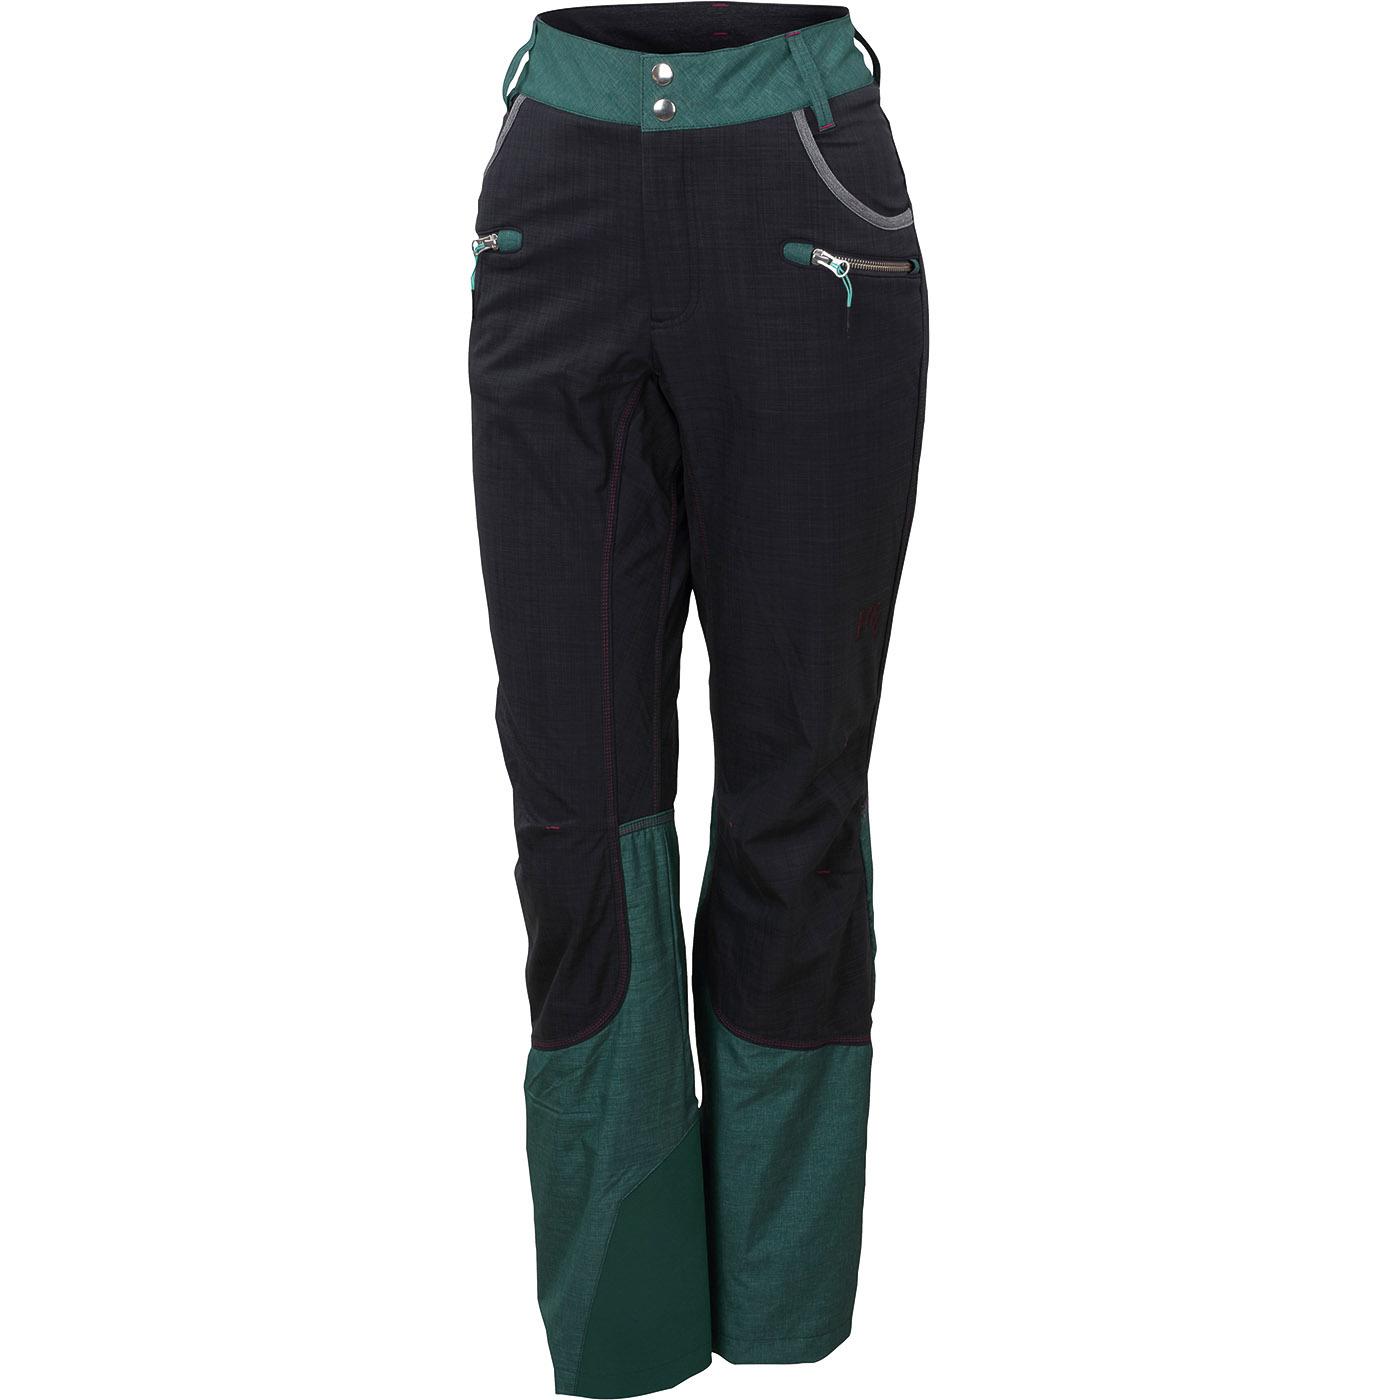 adbb0214c871 Dámske nohavice na skialp lyžovanie Baita zelené